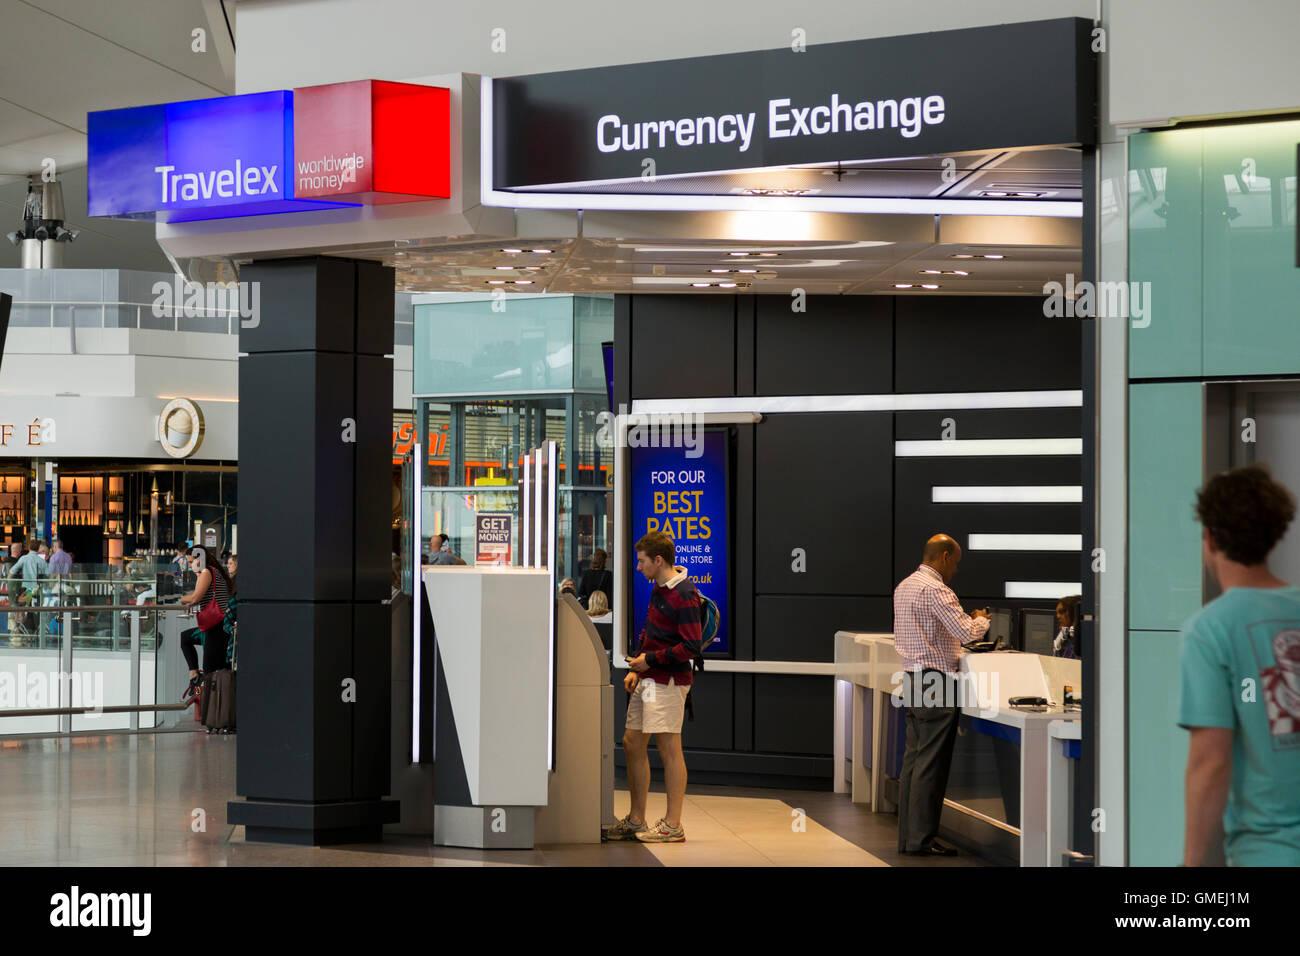 Bureau De Change Office Operated By Travelex At Heathrow Airport Terminal  London